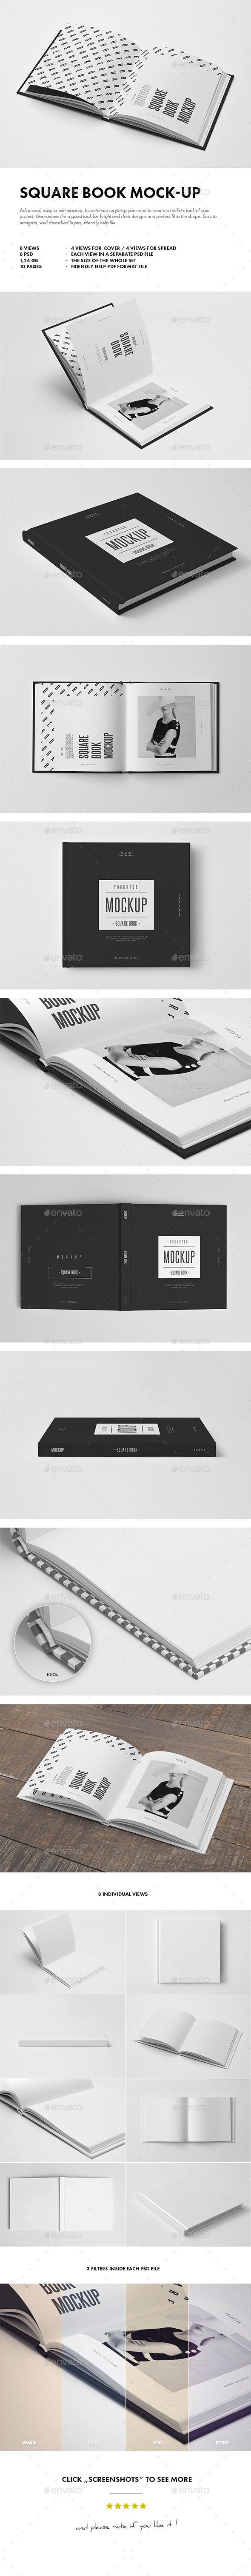 Square Book Mock-up | #bookmockup #mockups | Download: http://graphicriver.net/item/square-book-mockup/8911213?ref=ksioks